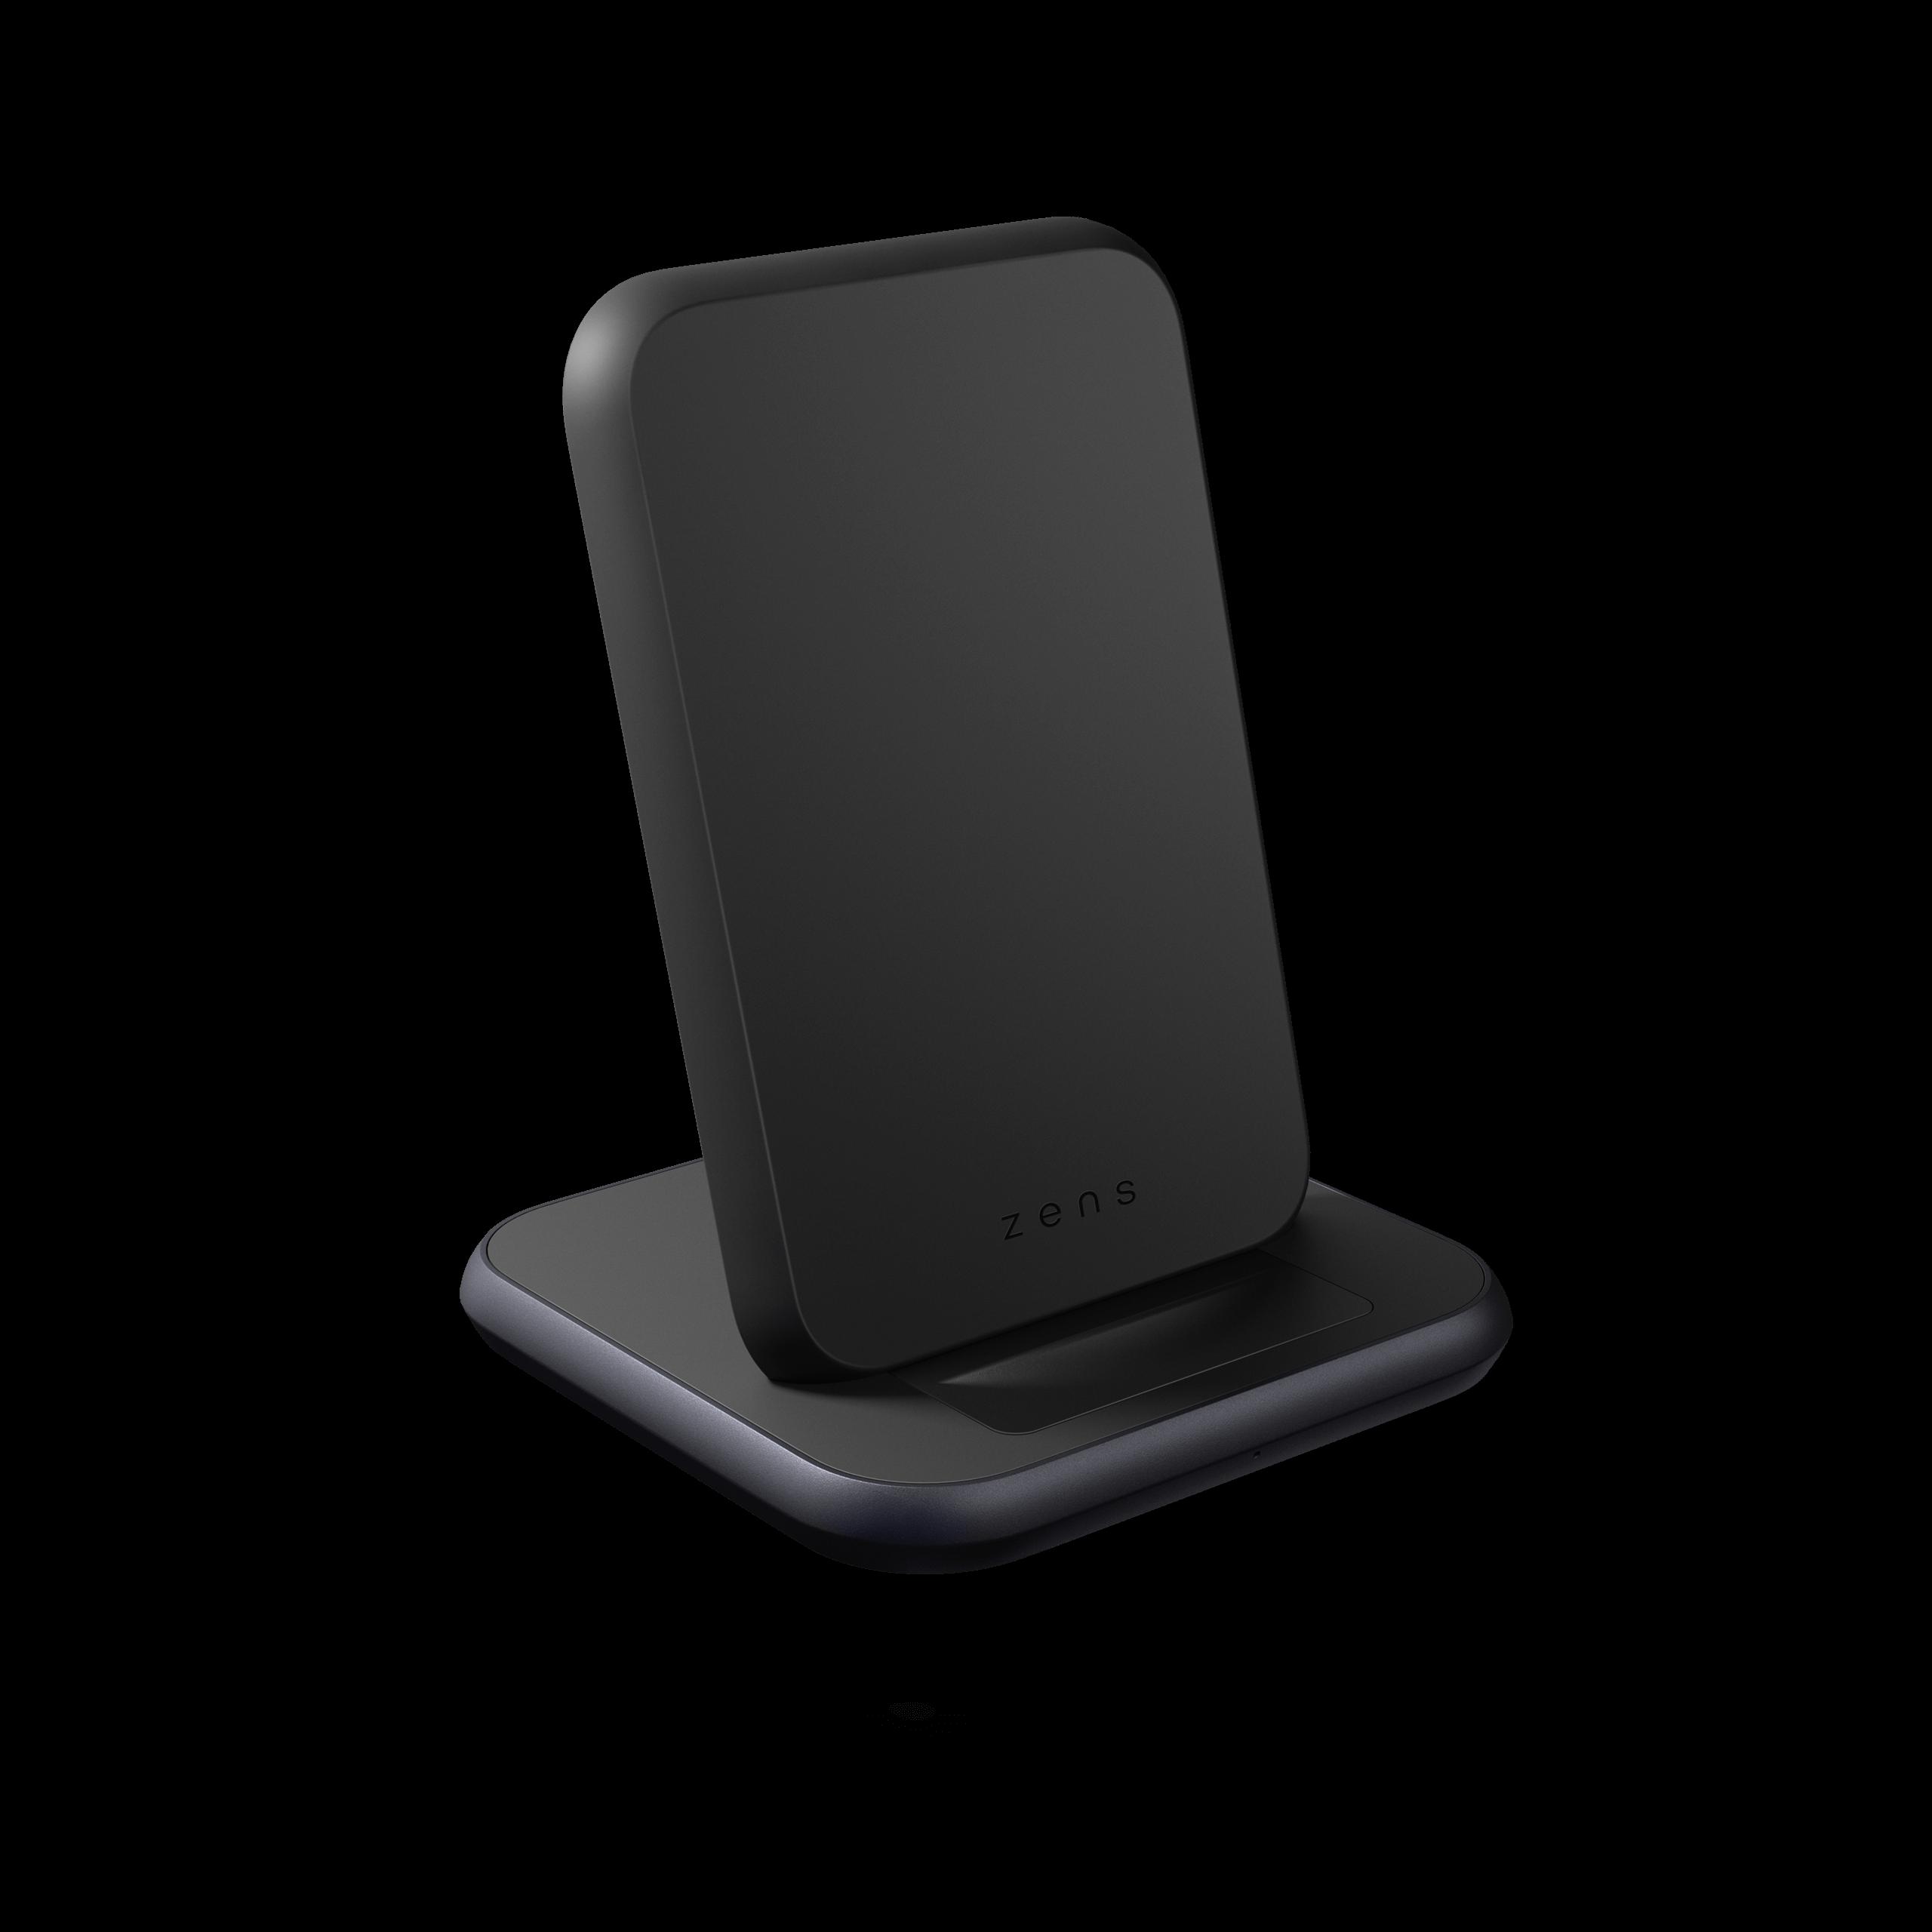 ZESC15B - Zens Stand Aluminium Wireless Charger Front Side View